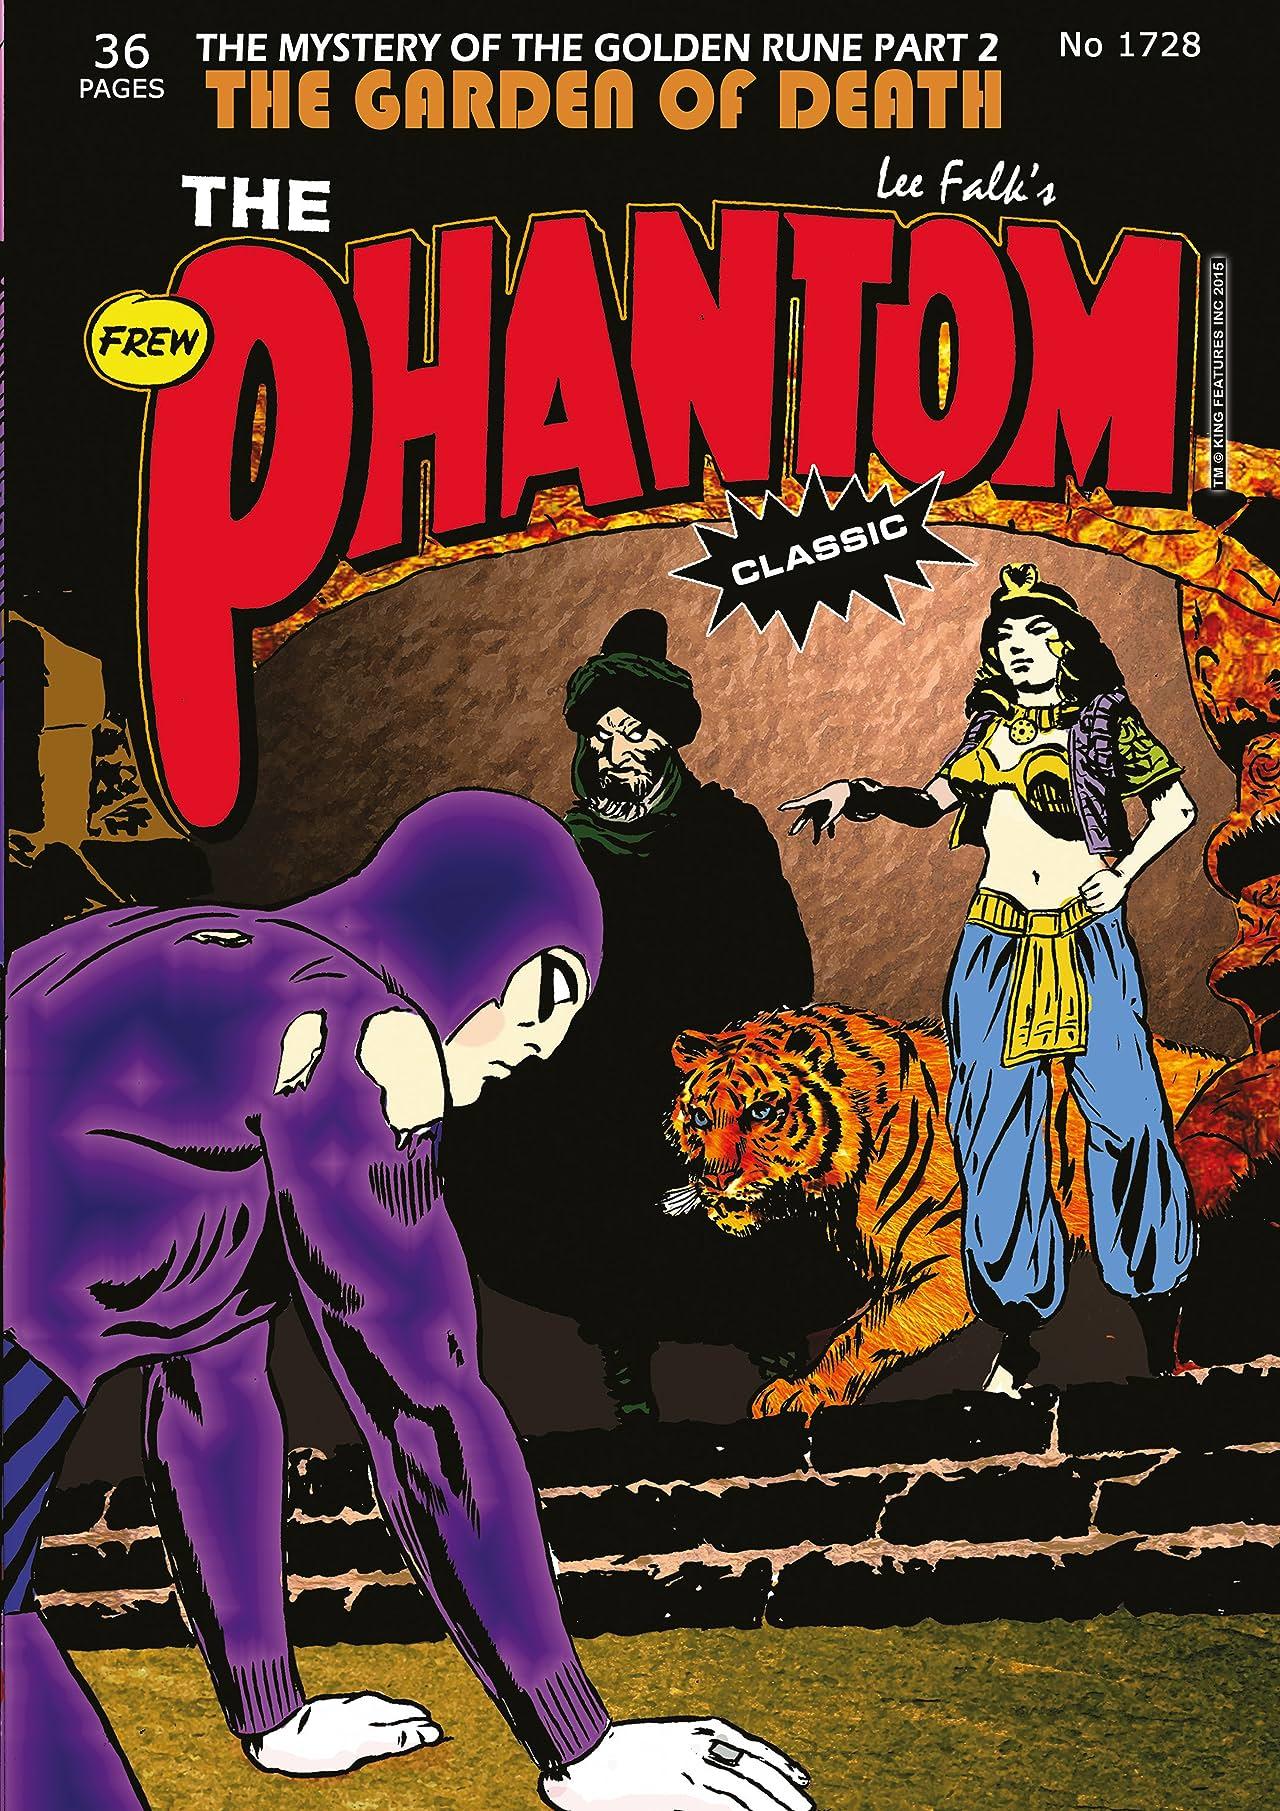 The Phantom #1728